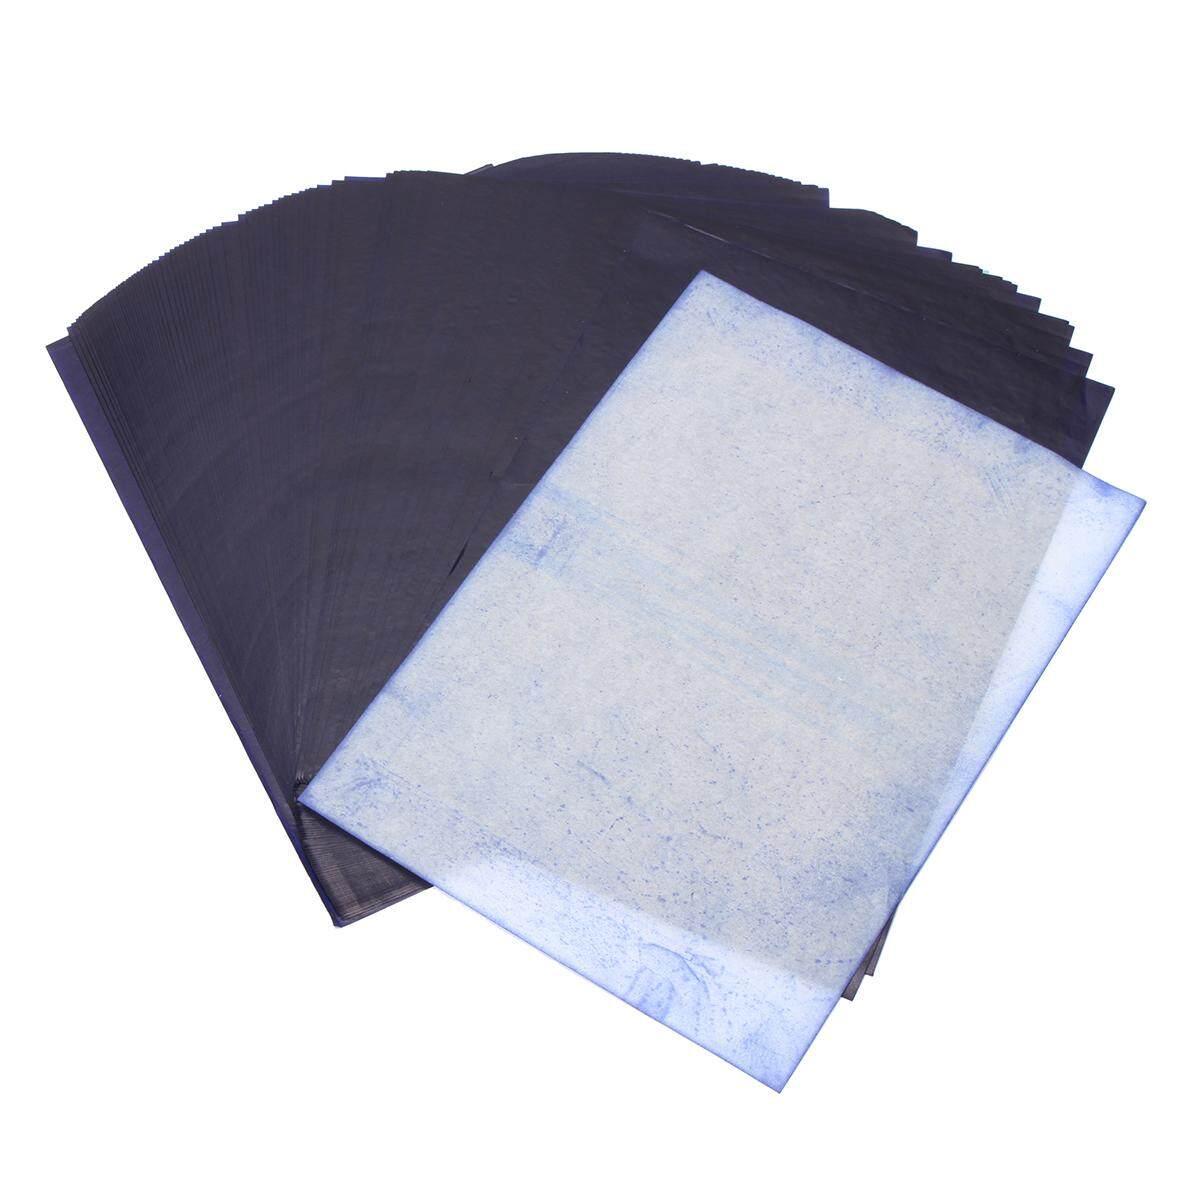 Review 100 Lembar A4 Gelap Biru Karbon Tangan Mesin Fotokopi Stencil Kertas Transfer Paper Hectograph Internasional